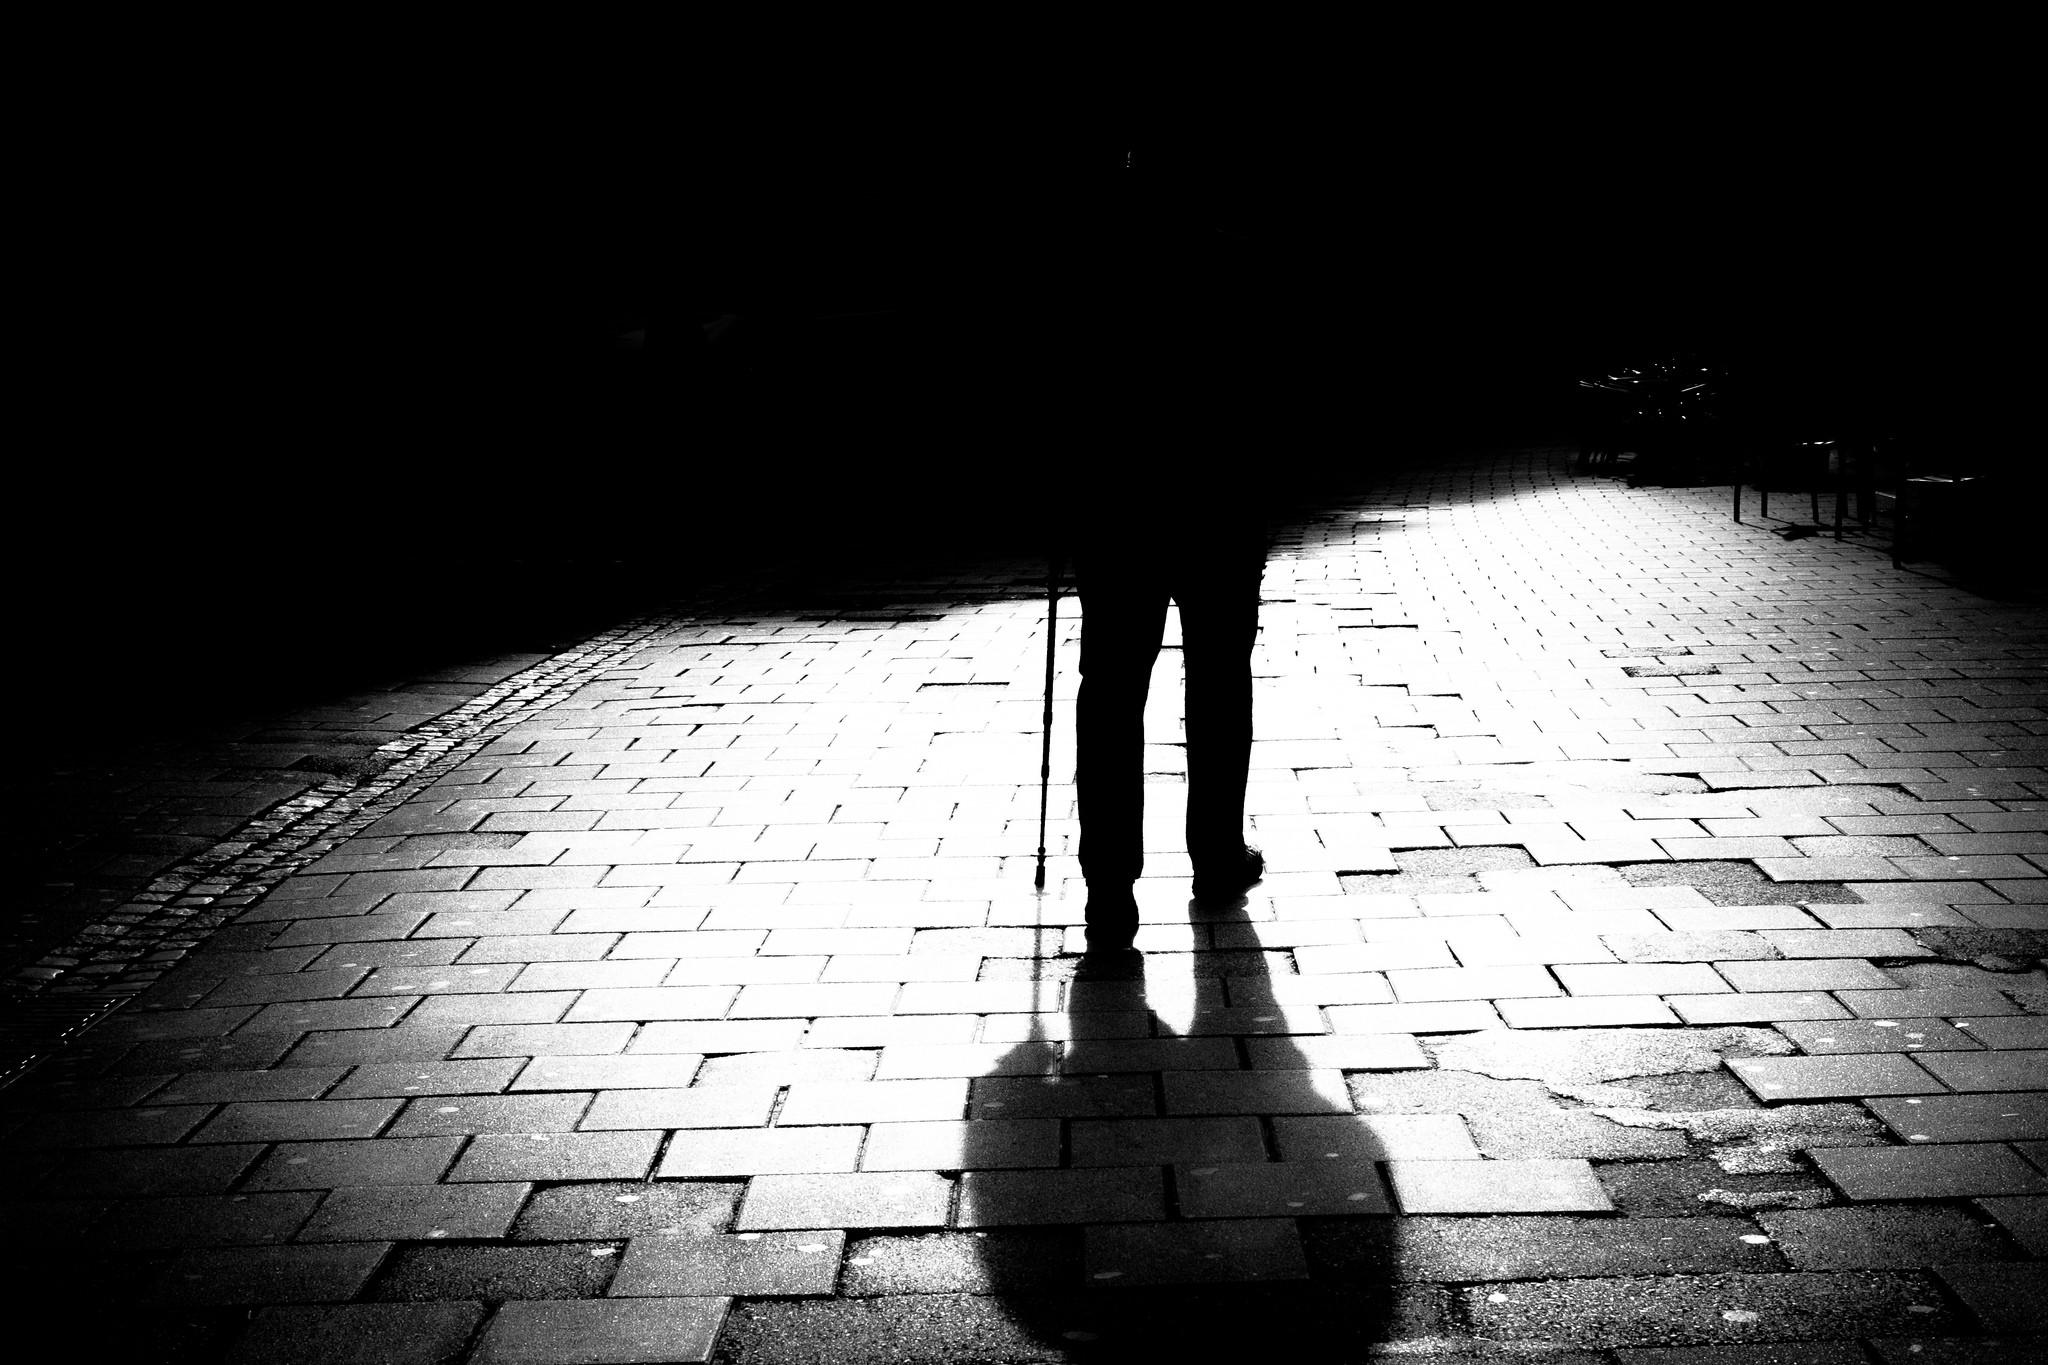 solidão (Foto: Flickr/R. Halfpaap)